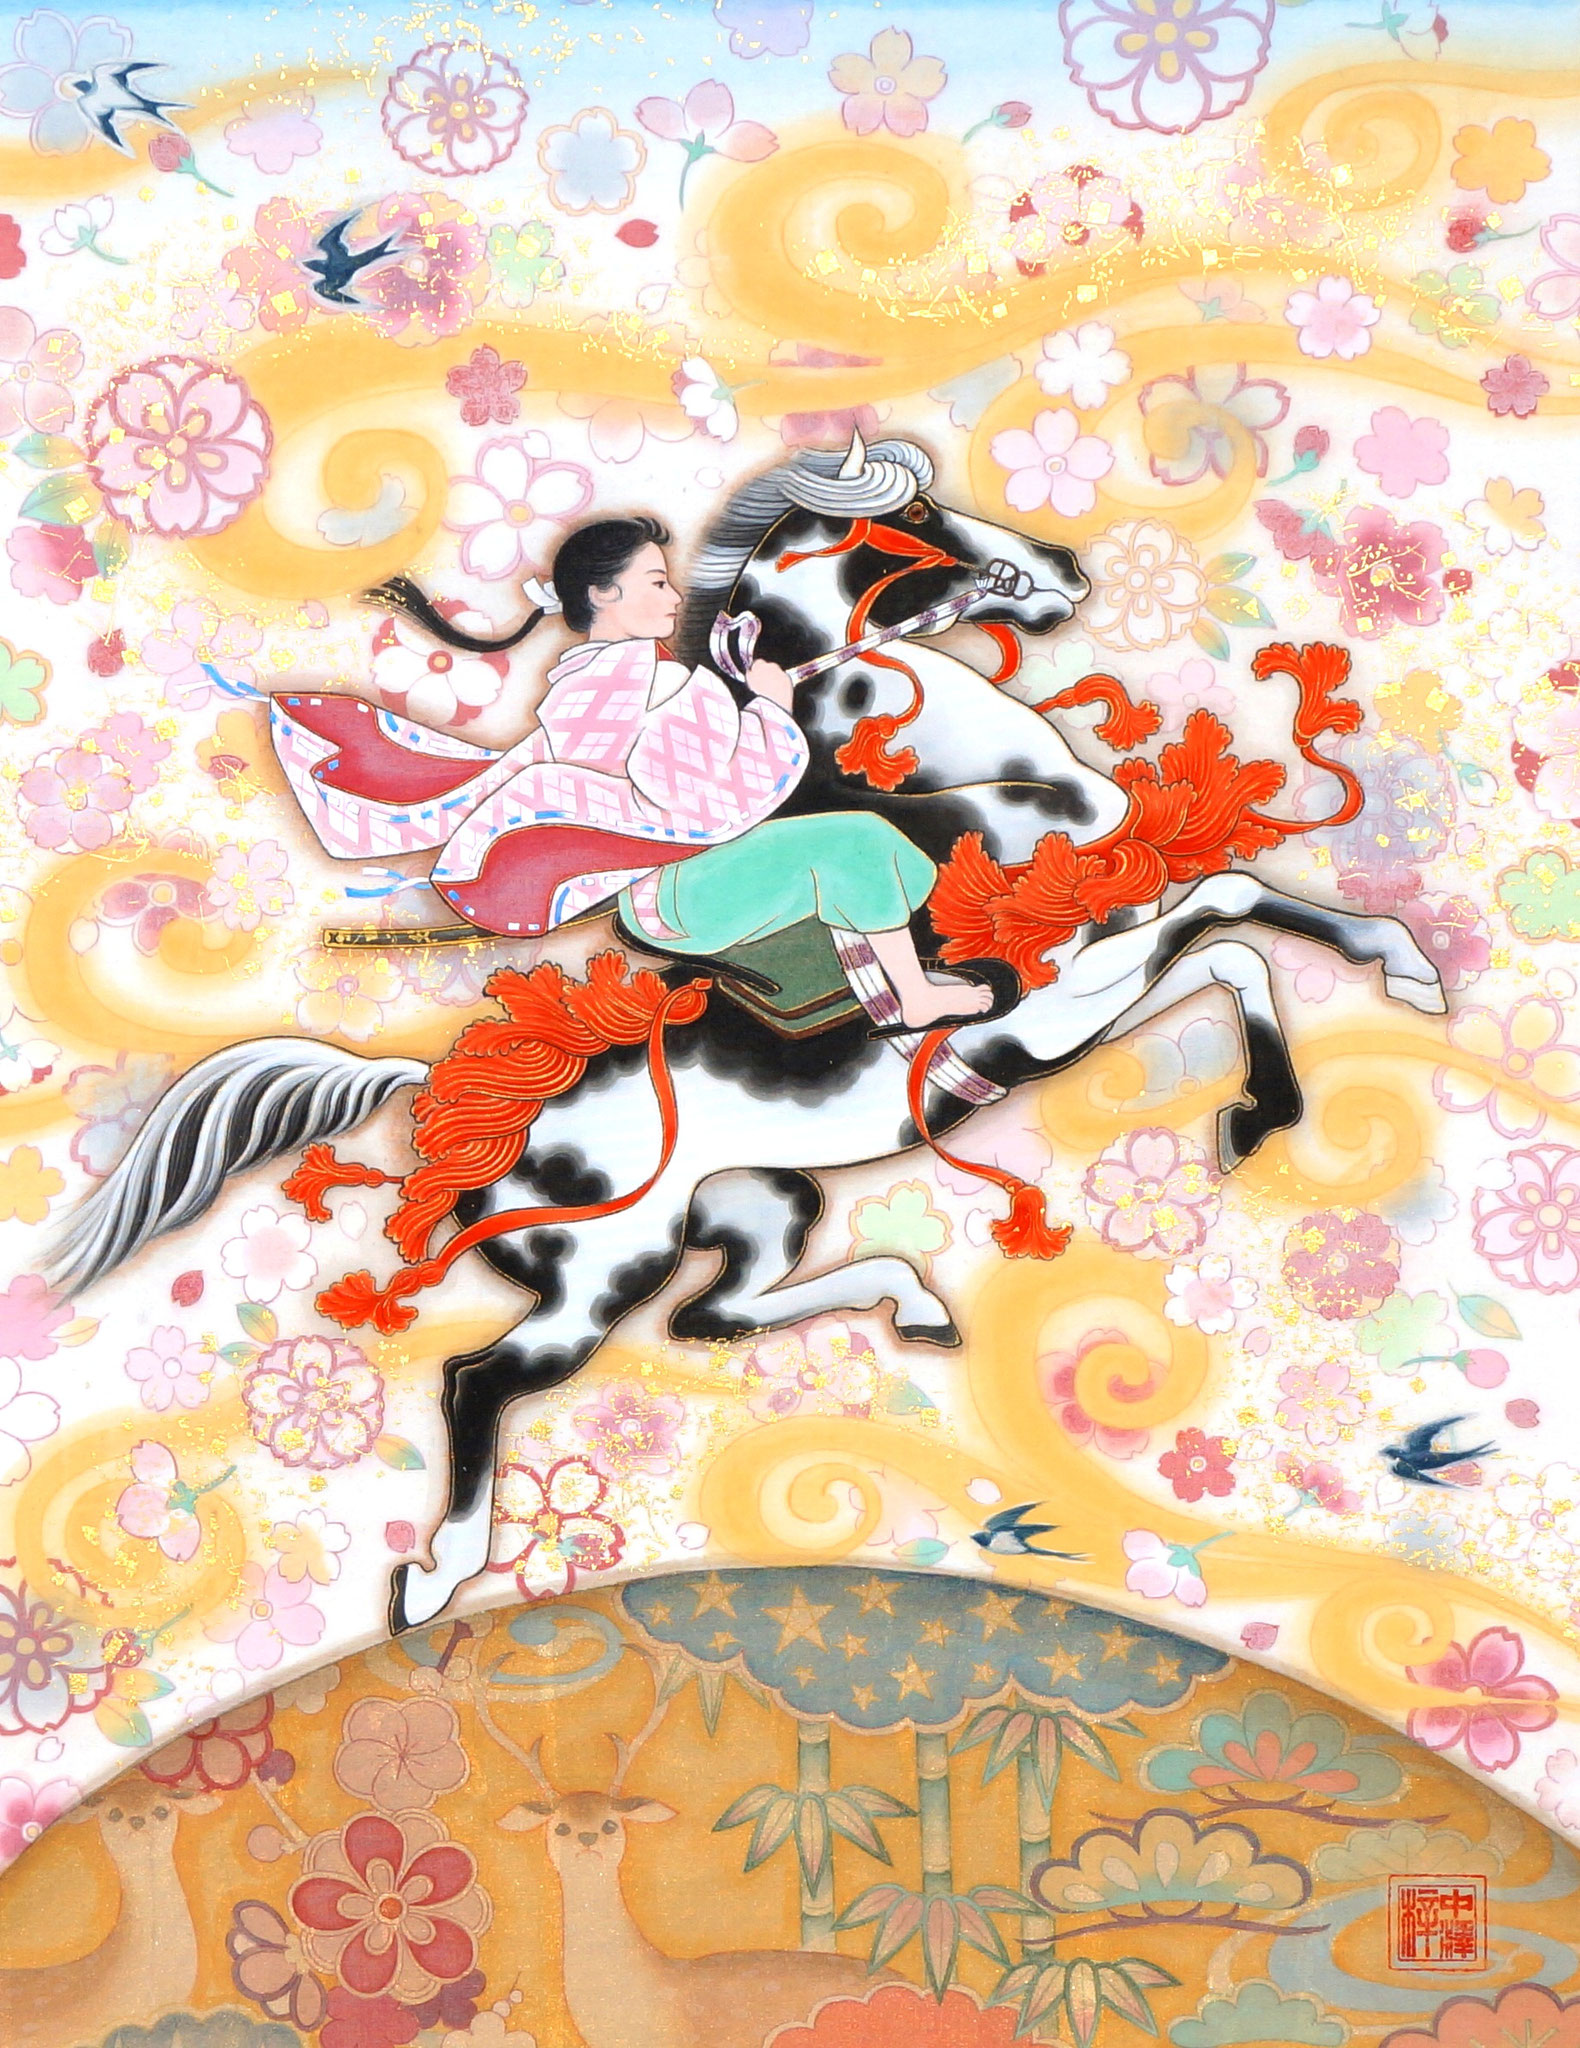 「RIDER~花嵐~」 F6号 絹本彩色・箔